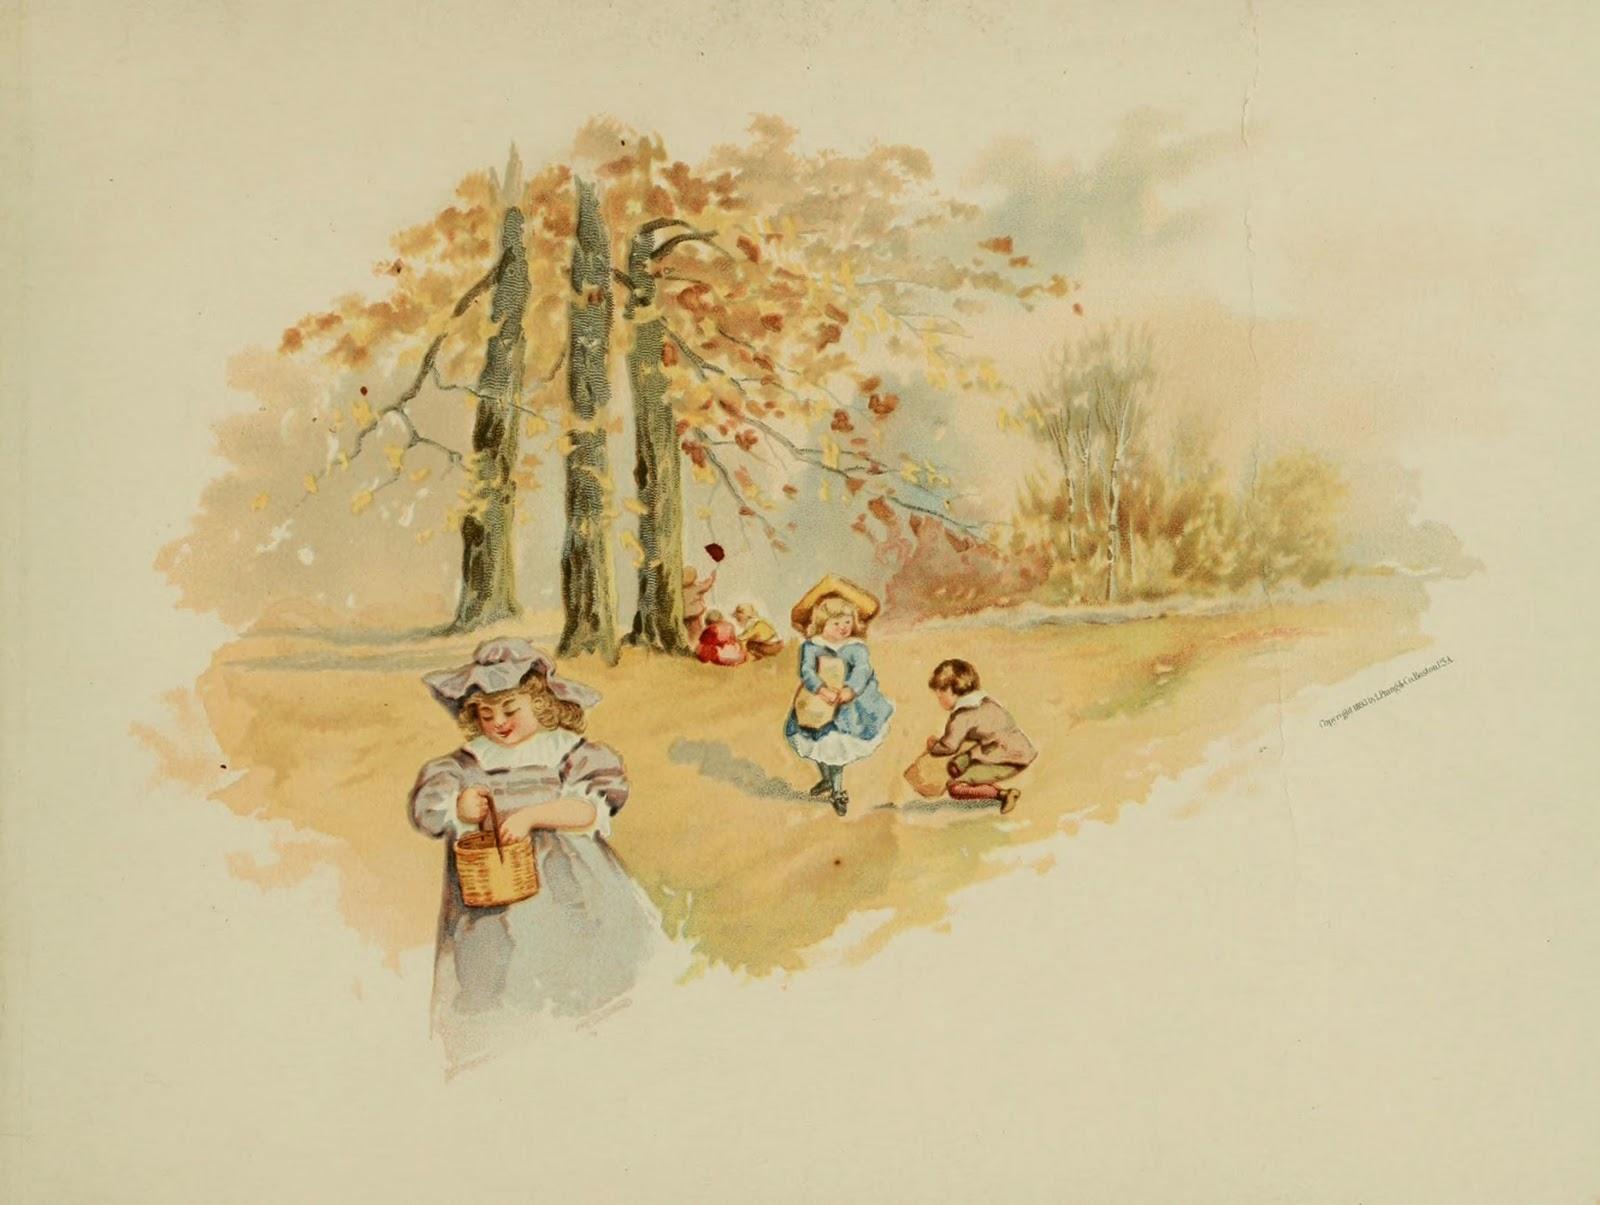 http://vintageephemera.blogspot.com/